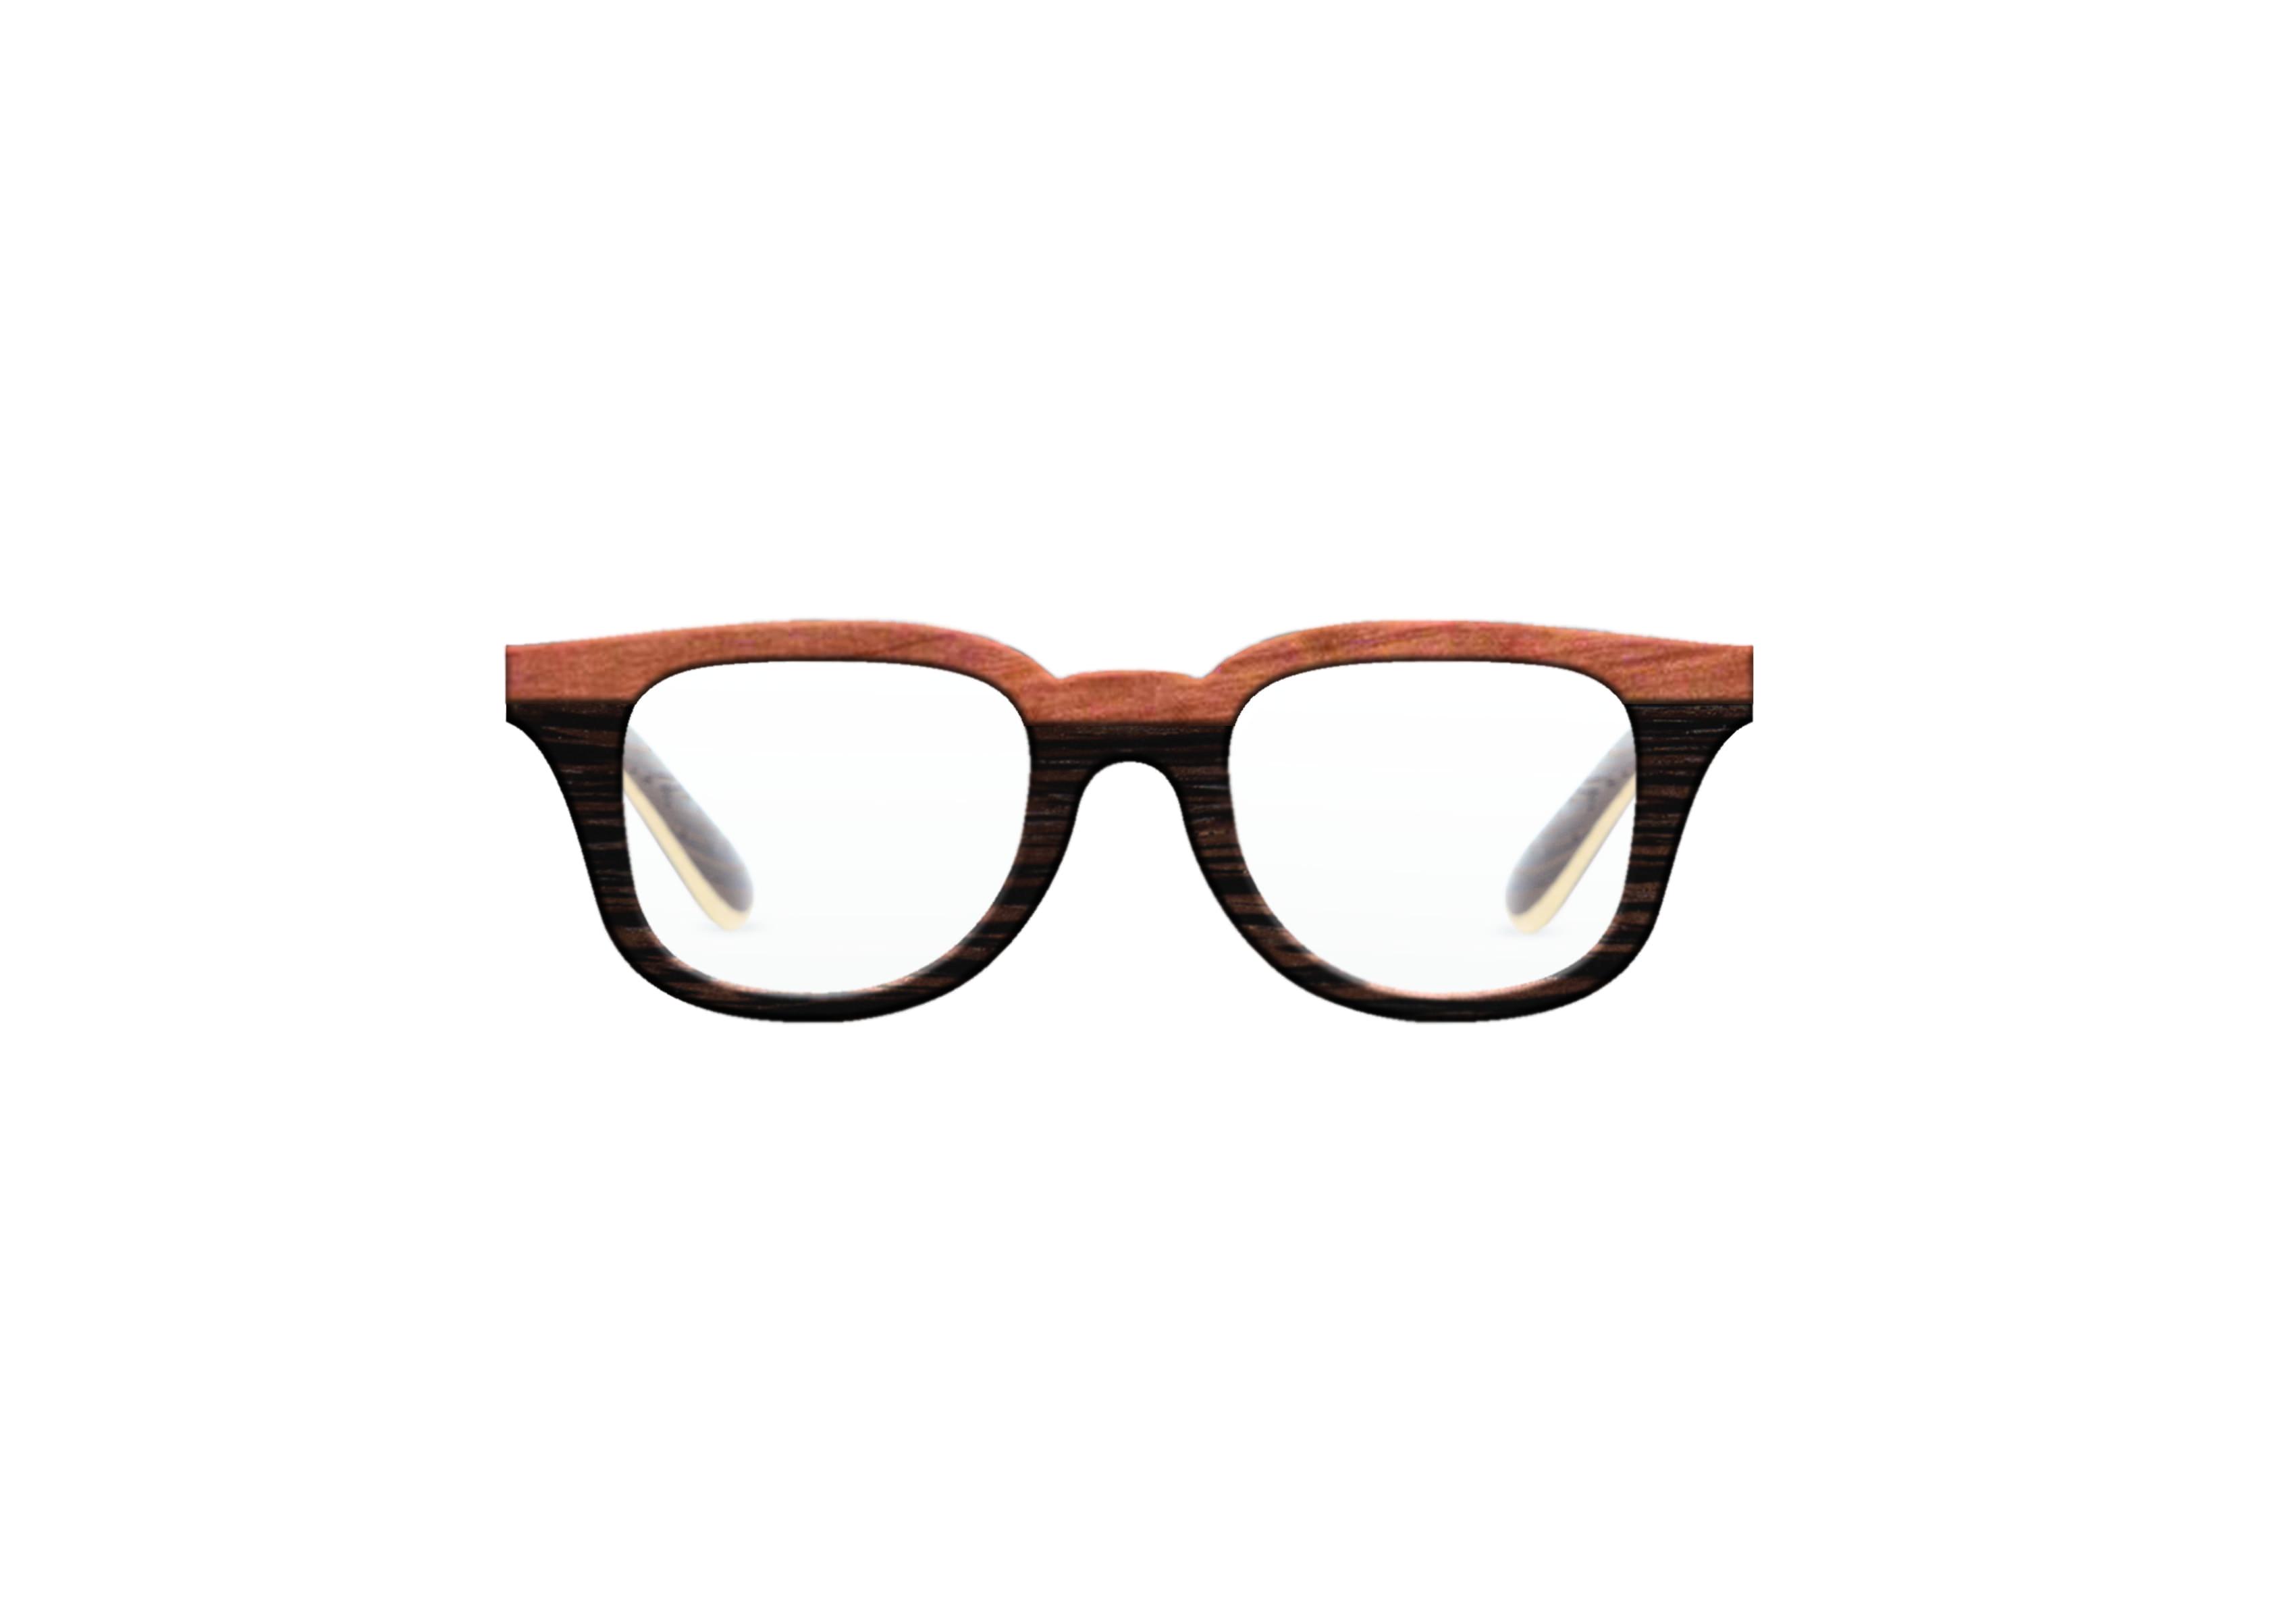 Ivy VAKAY handmade wooden eyewear